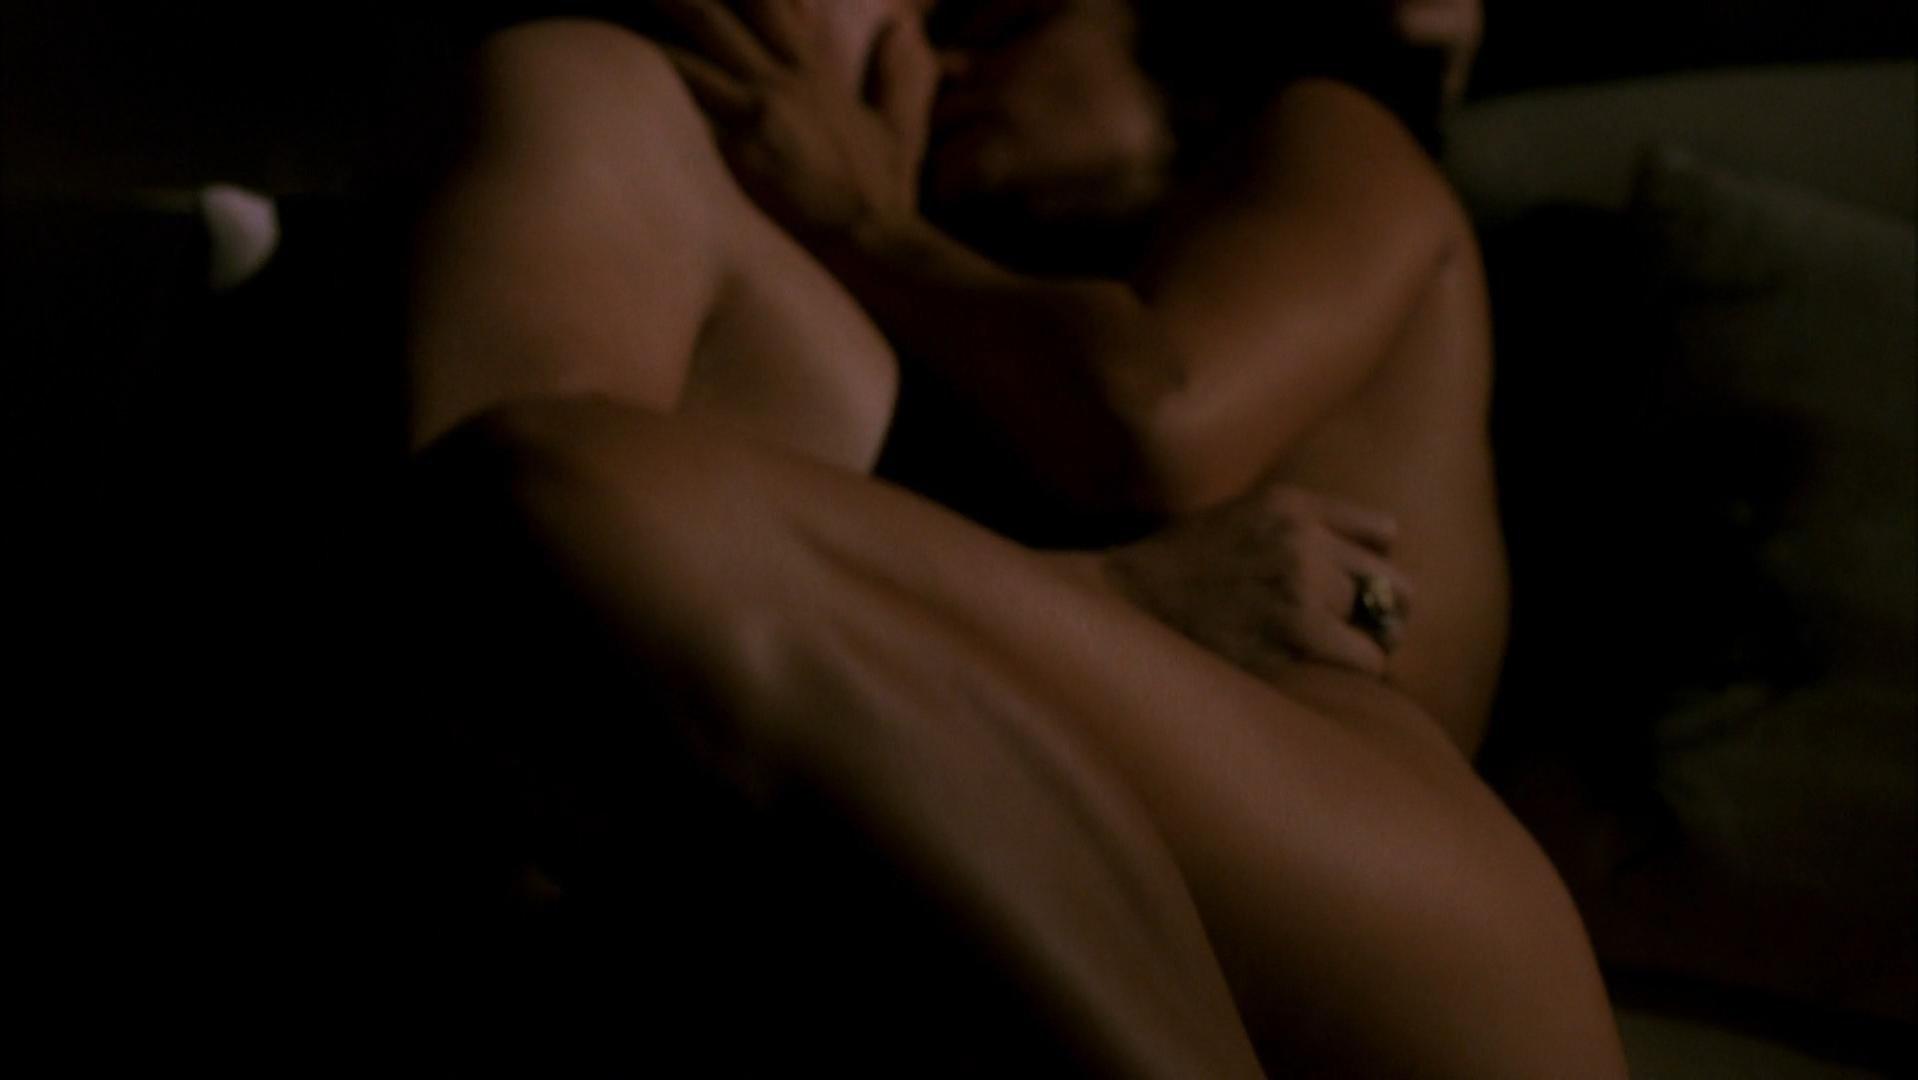 Indira Varma nude - Rome s01e06 (2005)